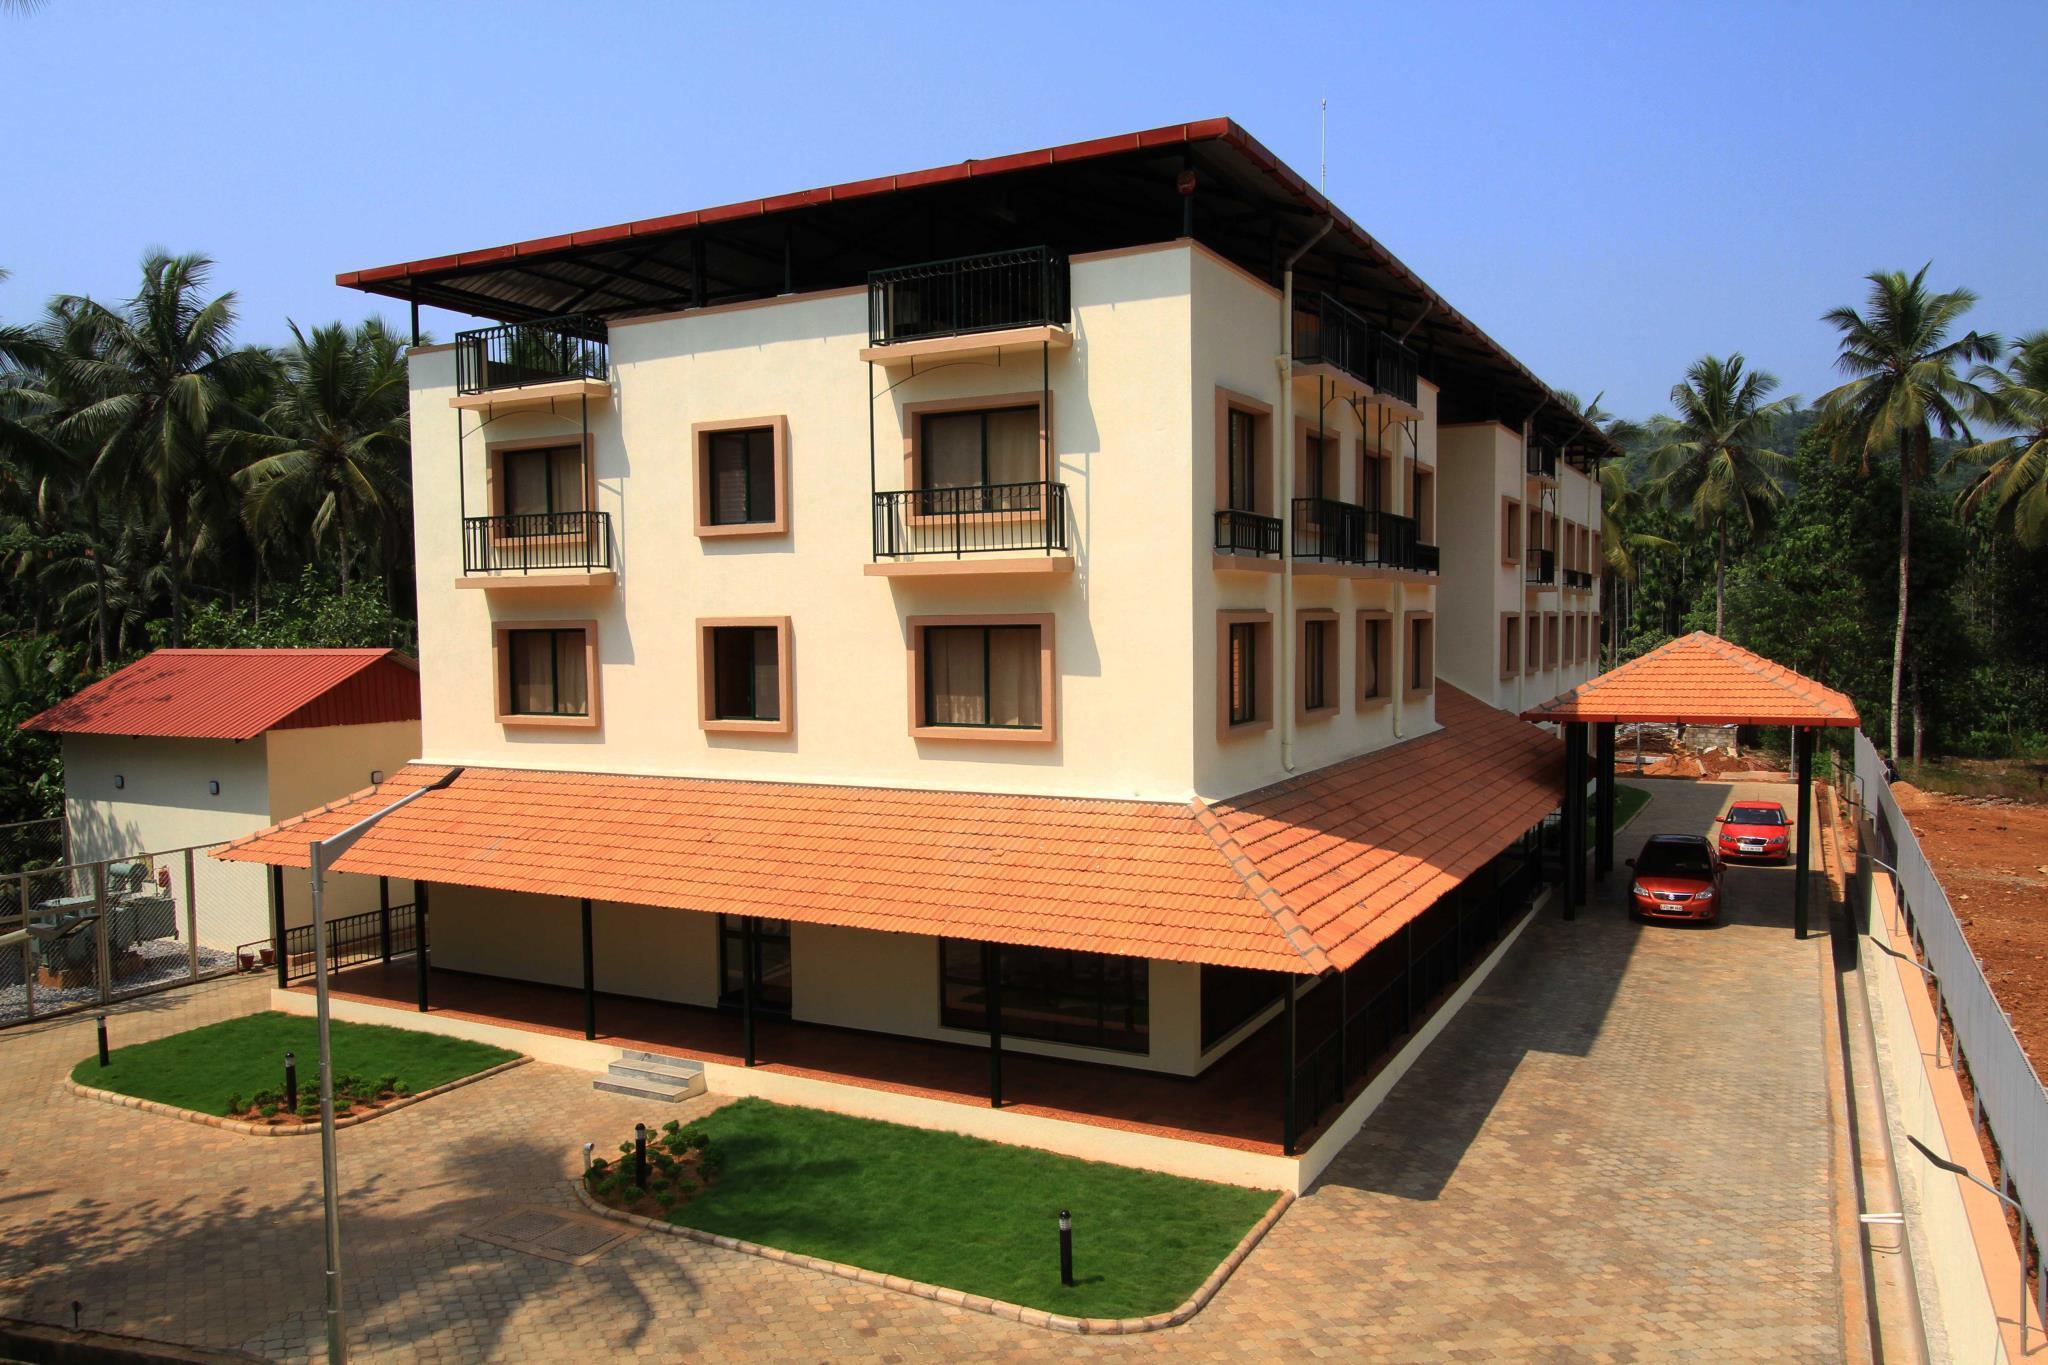 Discount Hotel Dwara, Kukke Subrahmanya